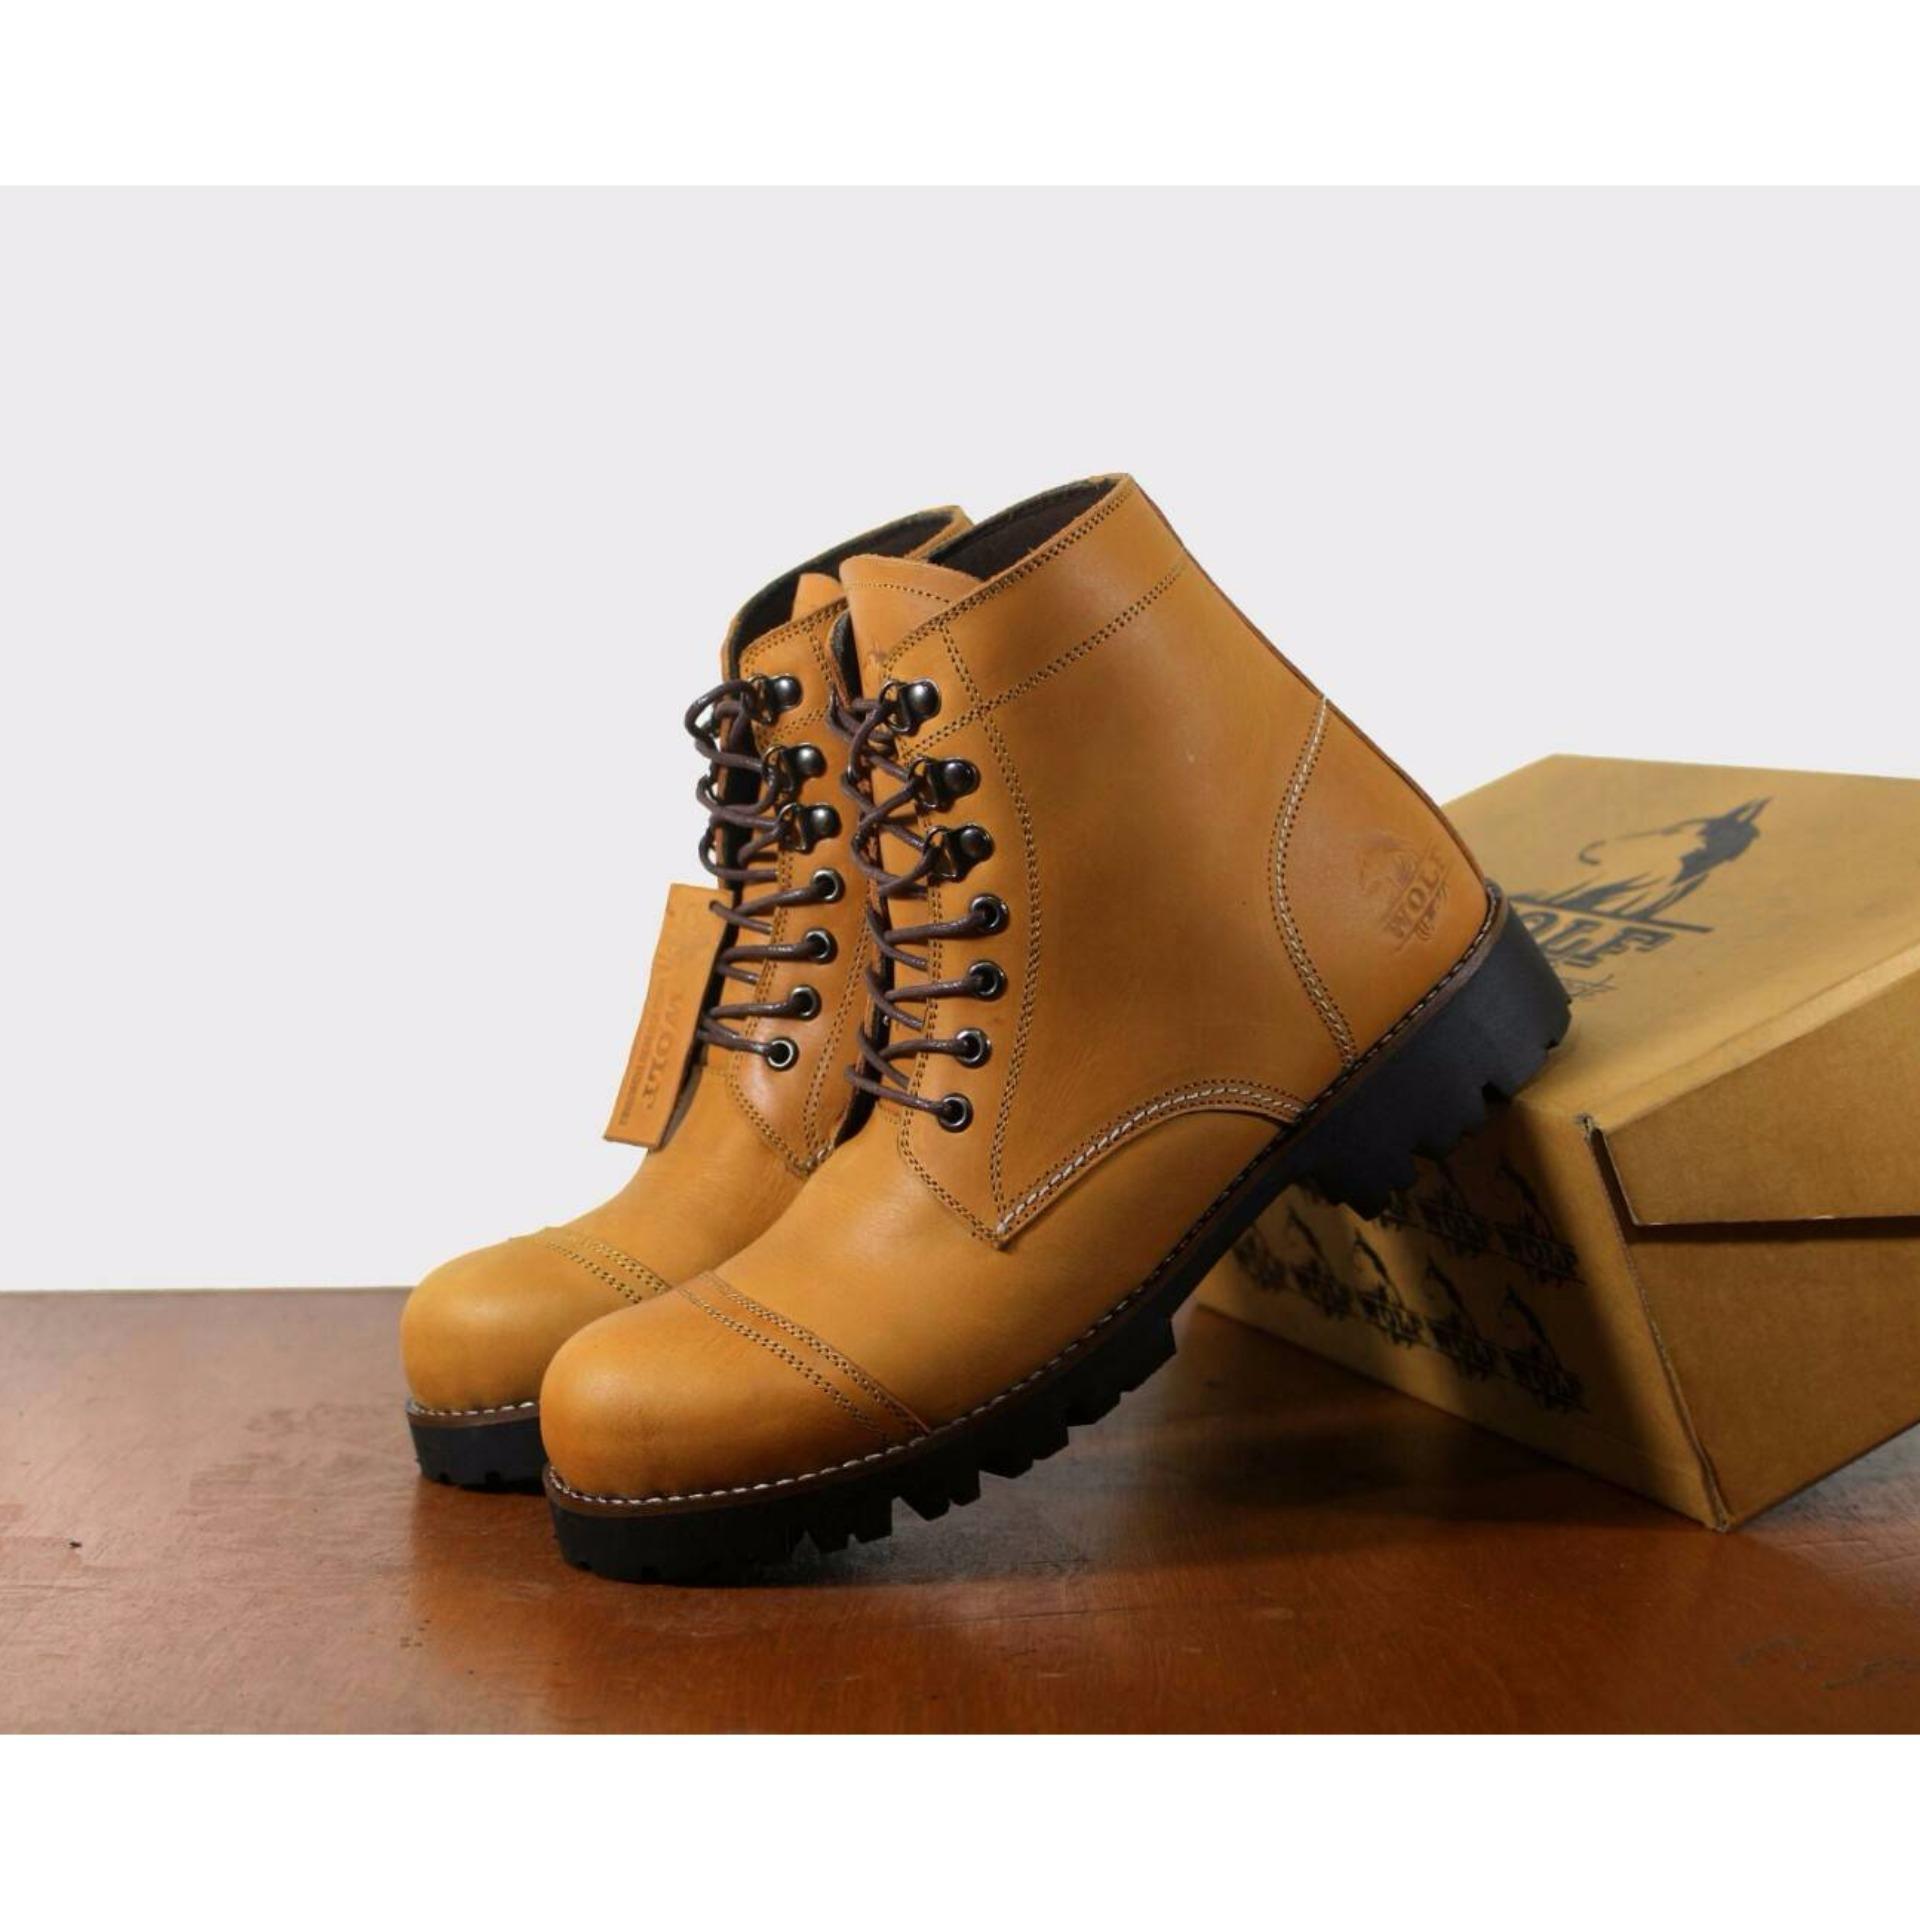 KERAK STORE Sepatu Safety Boots Trecking - Sepatu Boots Safety Leather  men s - 15c5956e5b